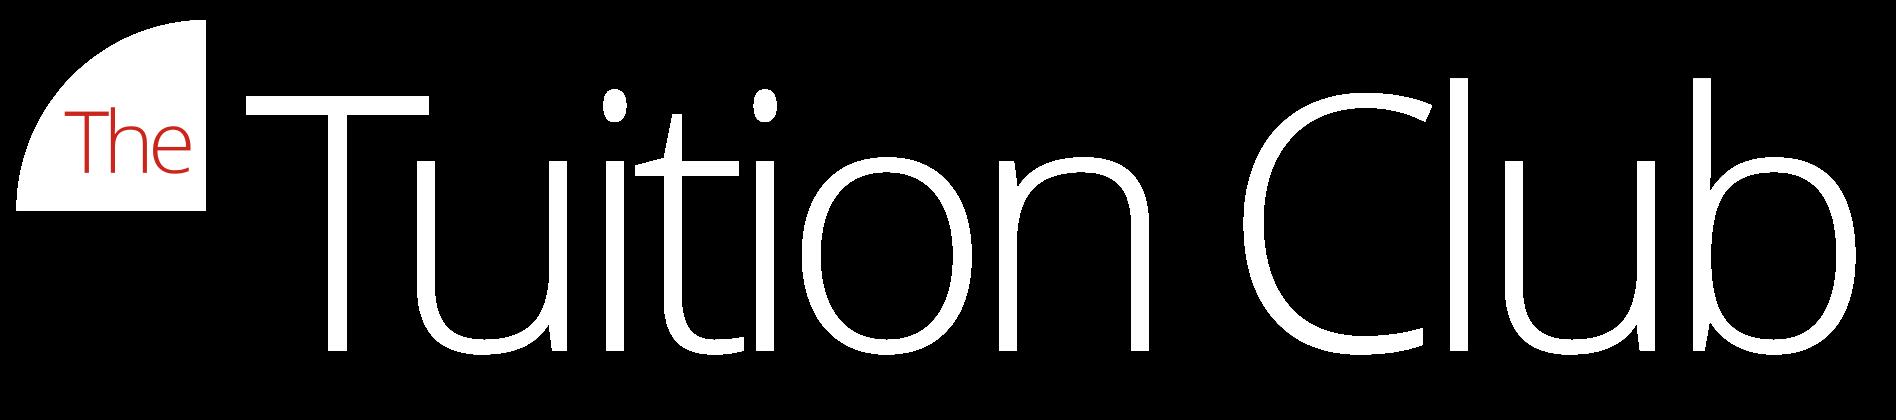 logo-invert_1